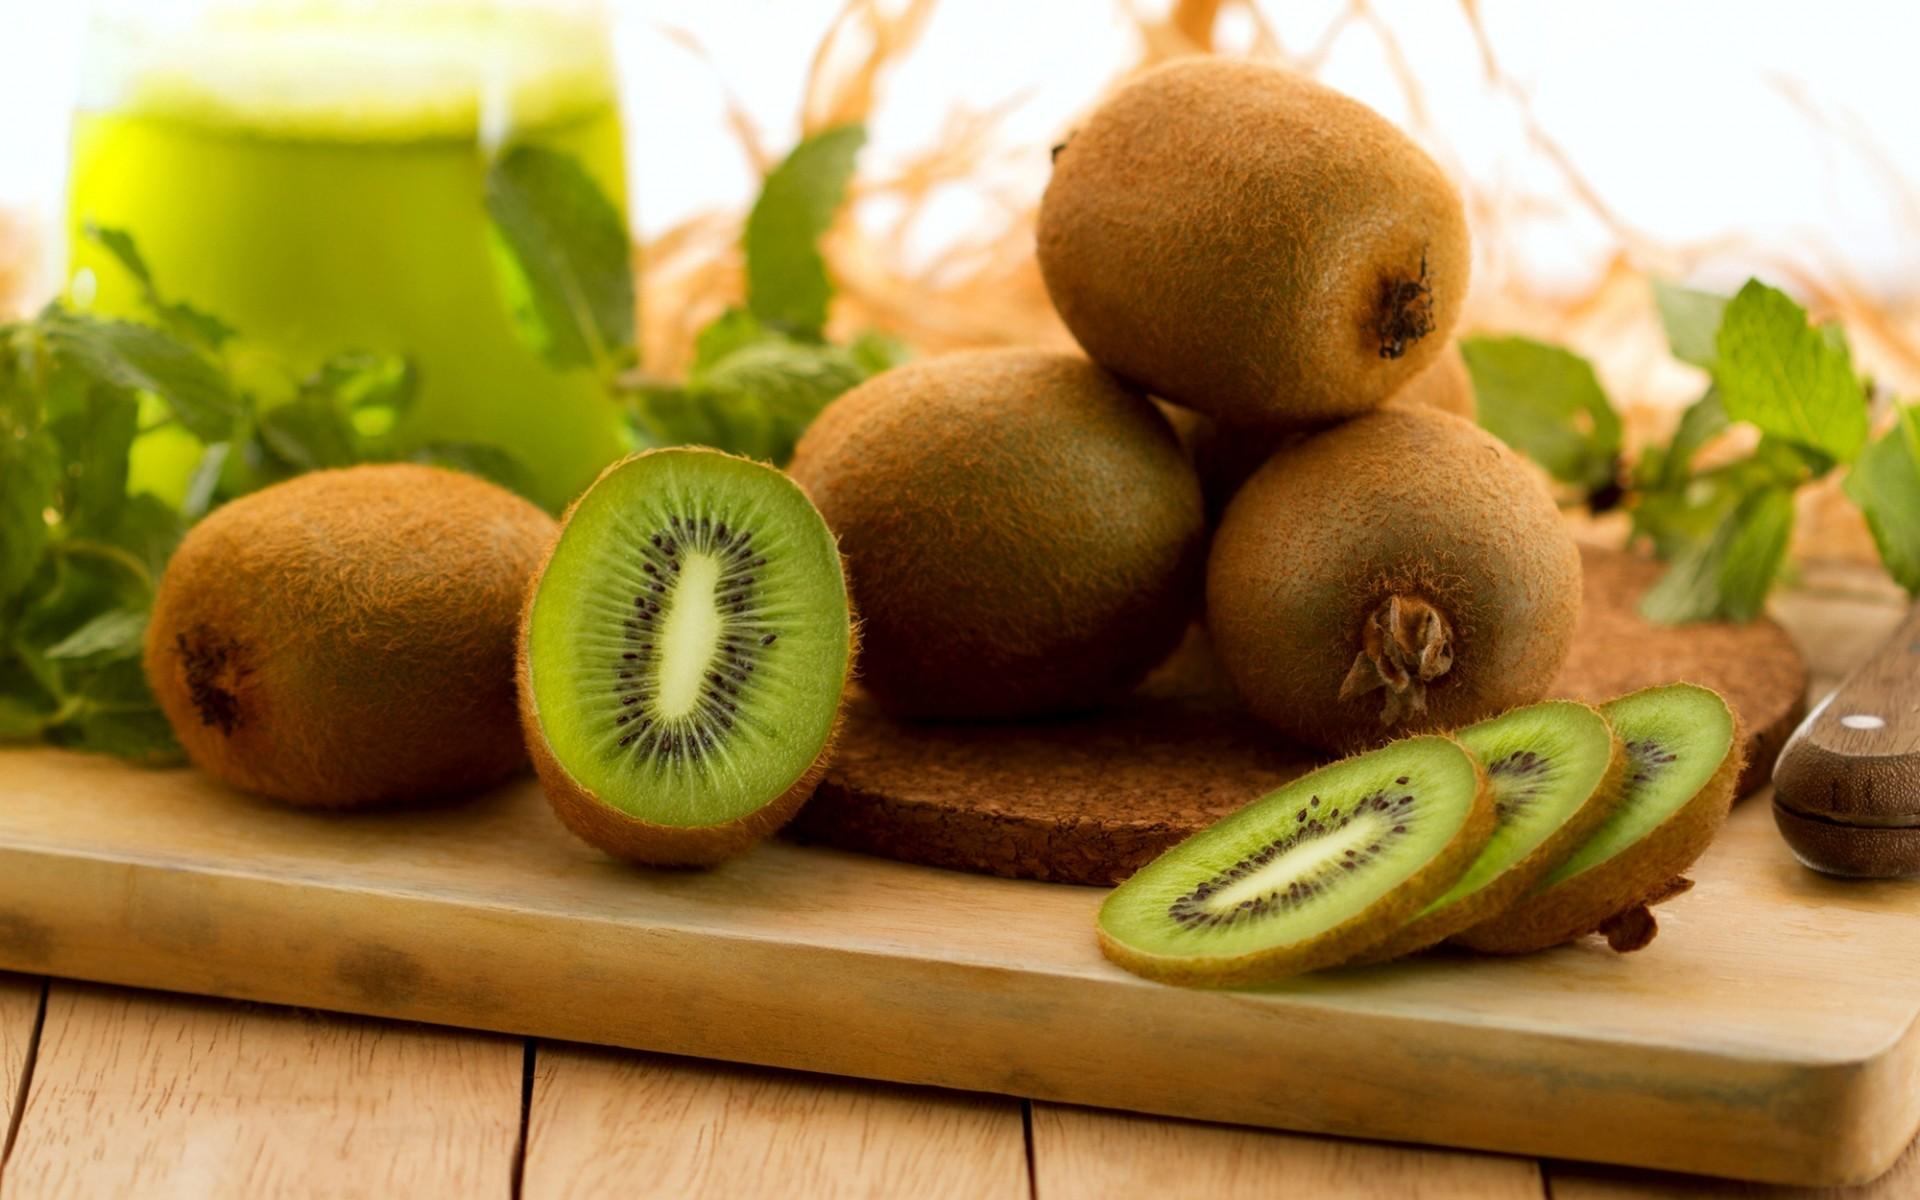 kiwifruit3.jpg